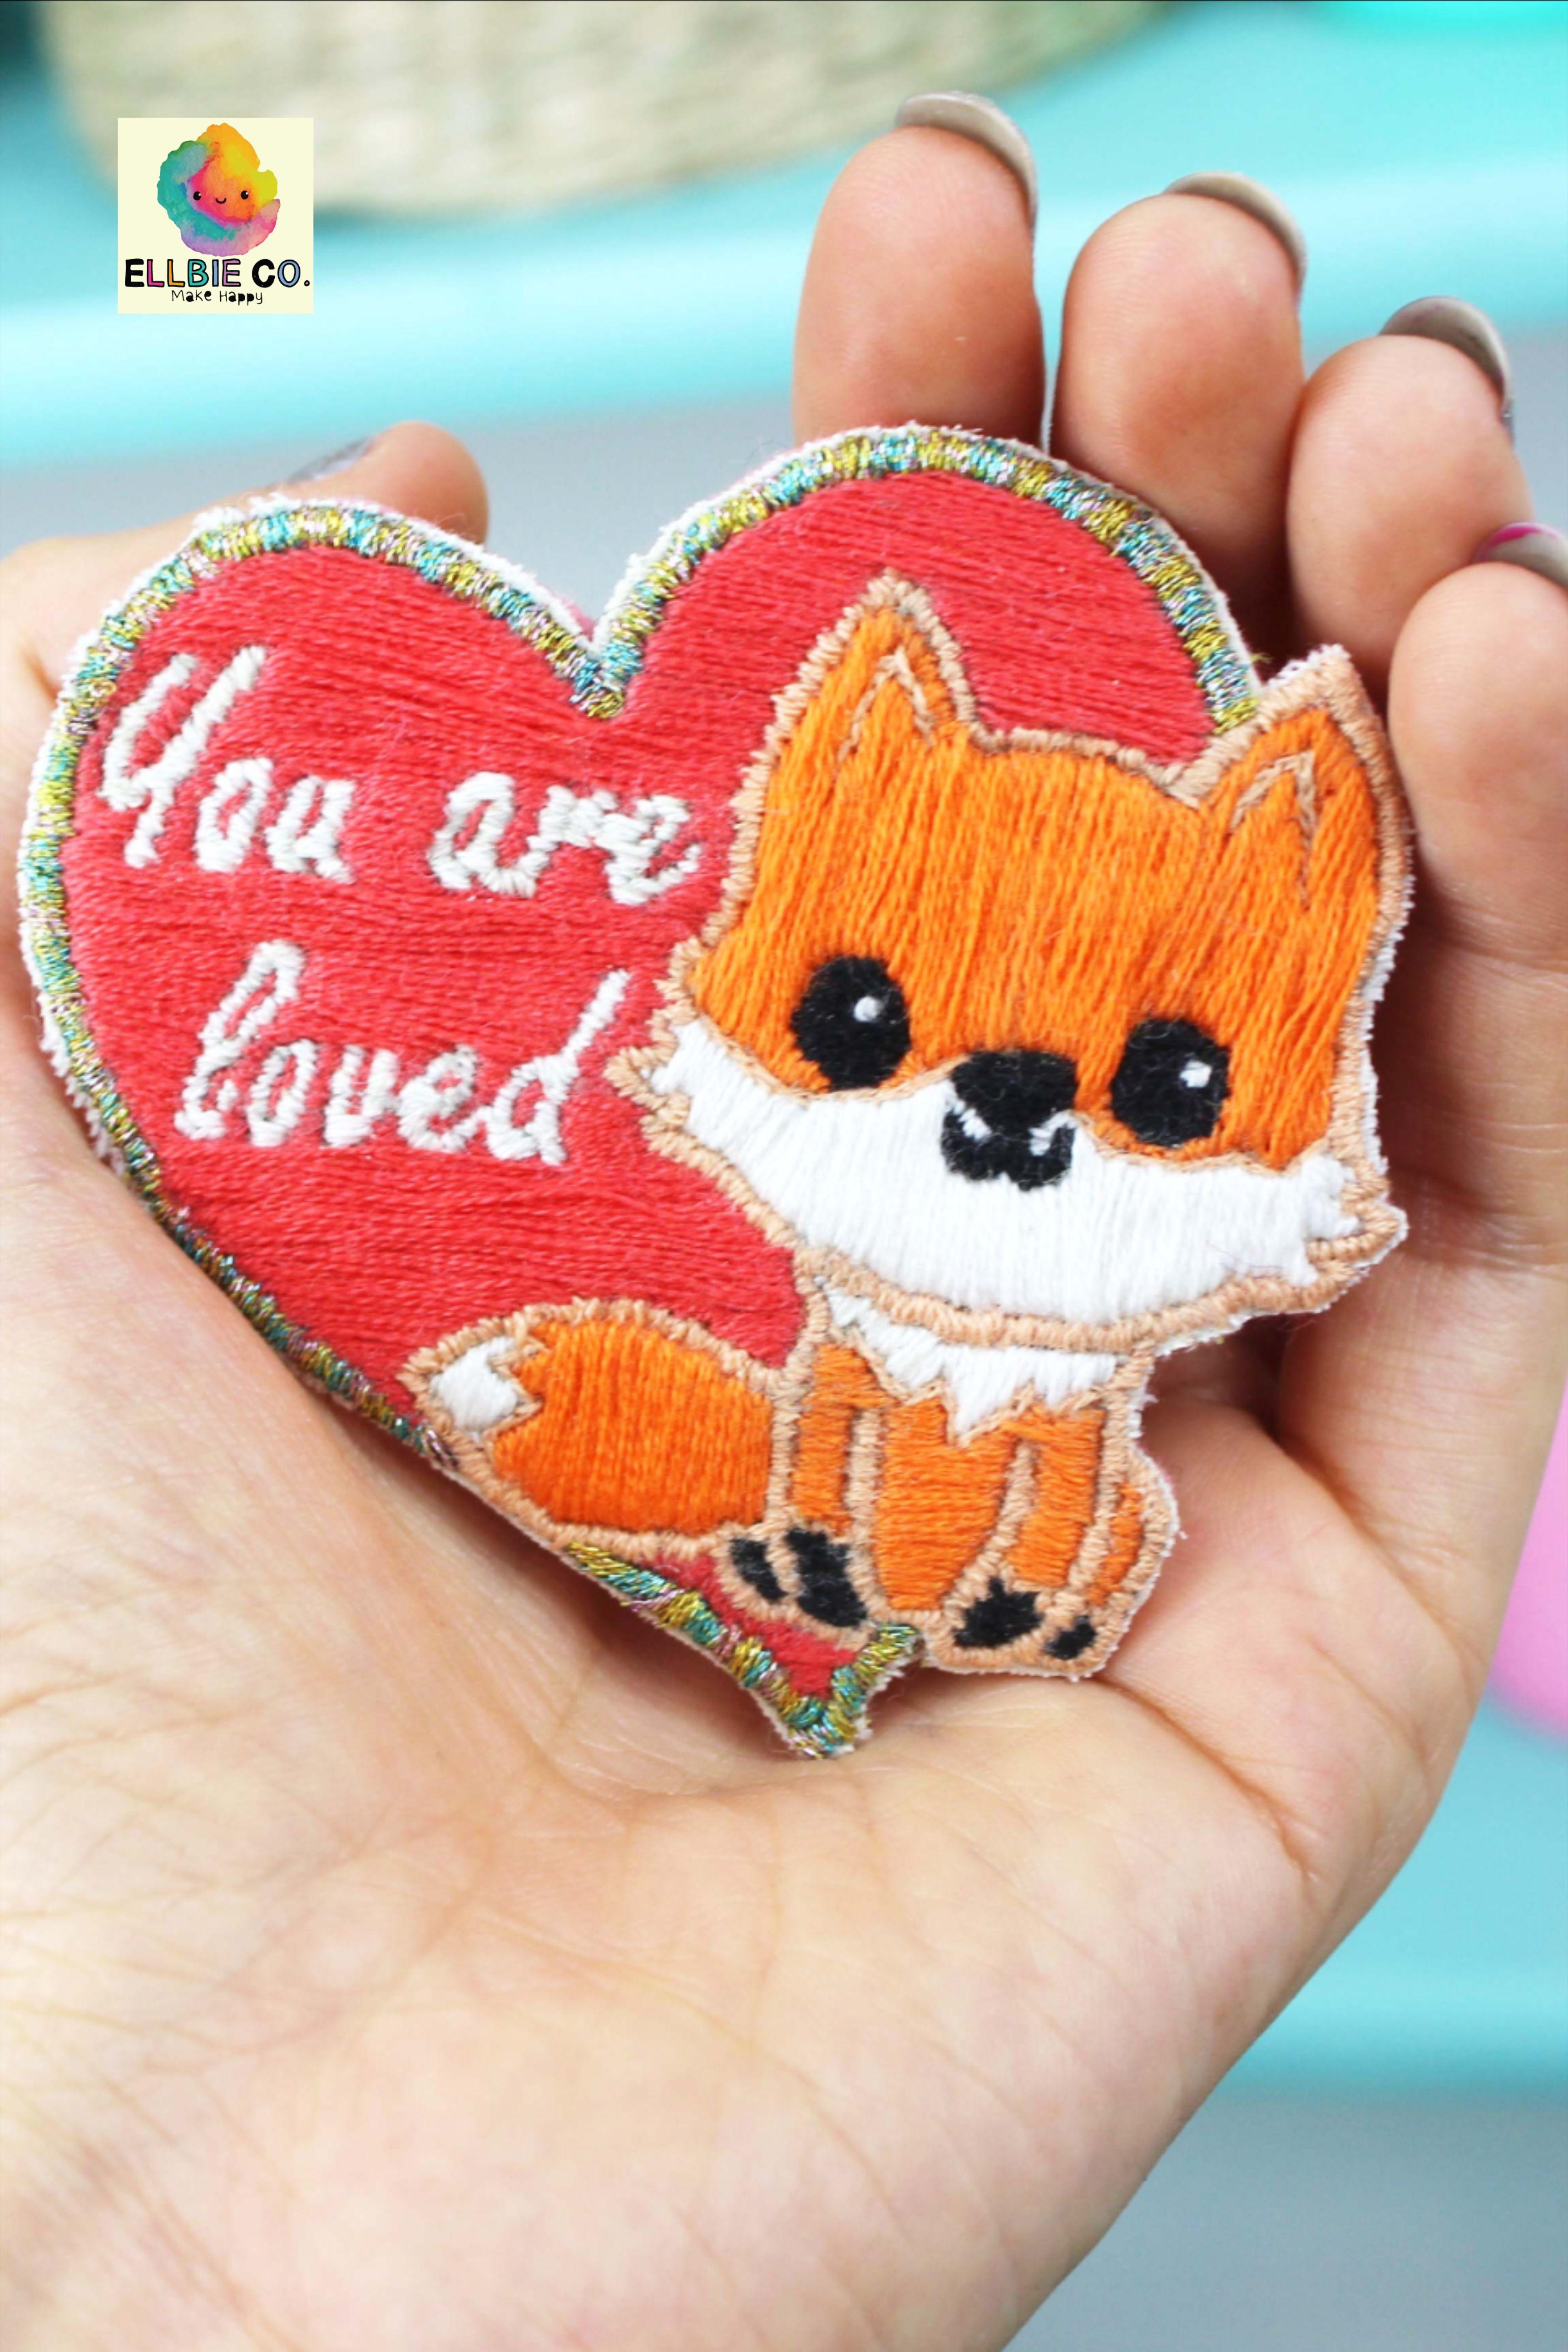 Diy fox embroidery patch kit ellbieco embroidery kits